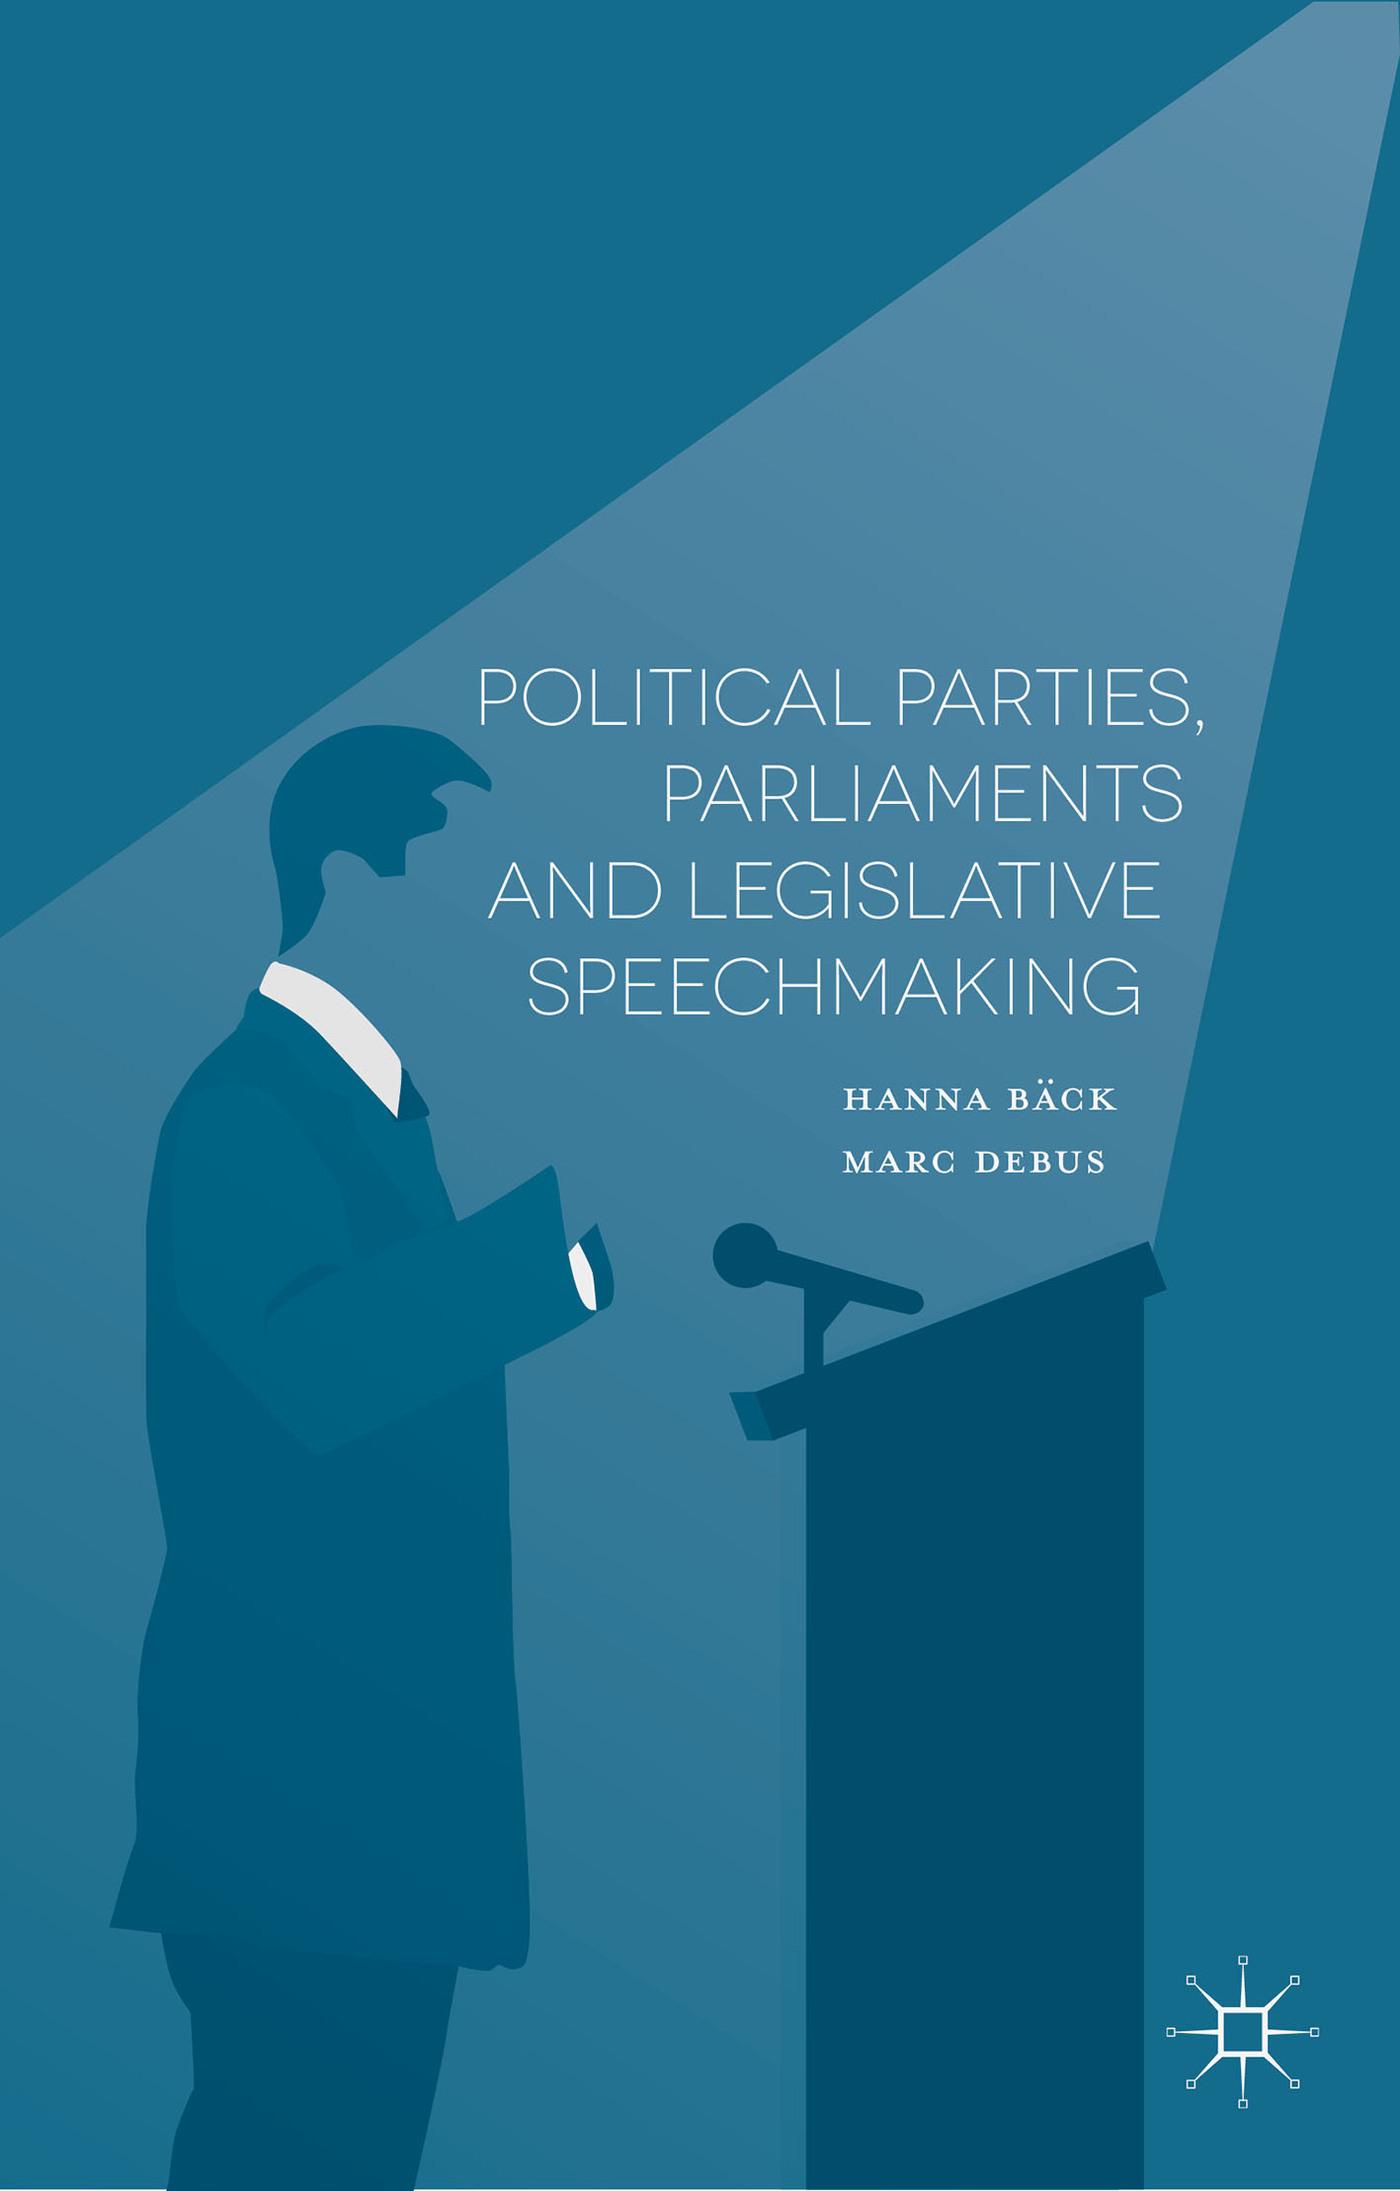 Political Parties, Parliaments and Legislative Speechmaking Hanna Bäck